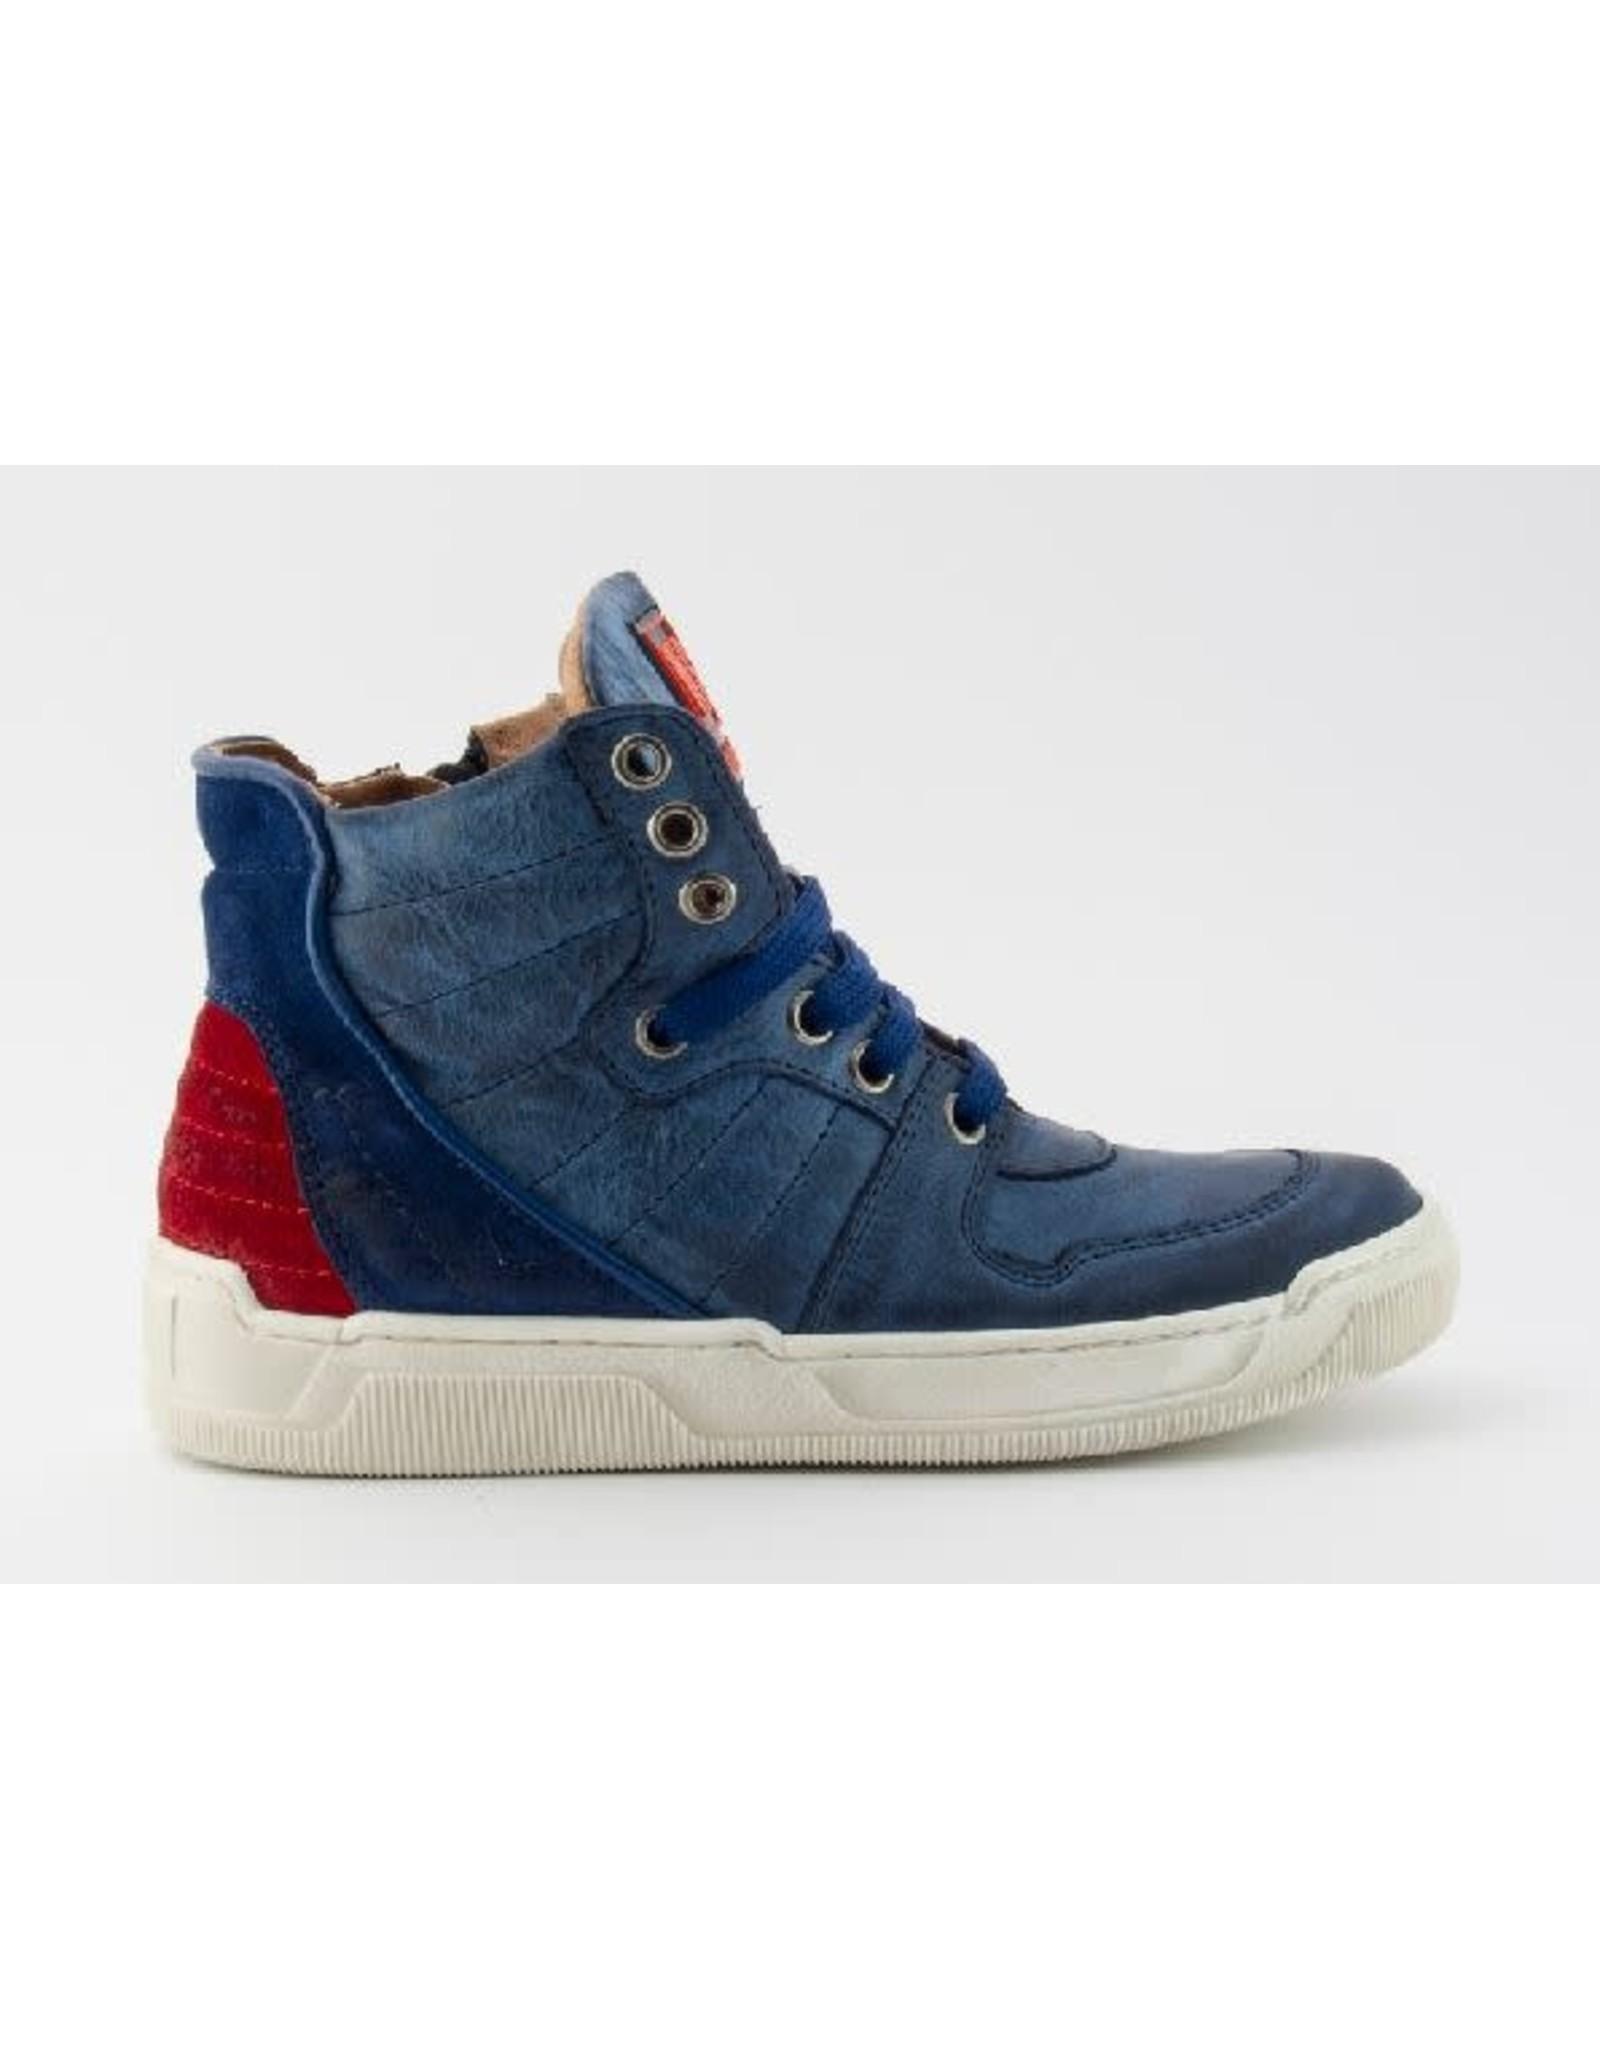 Andrea Morelli sneaker blauw rood